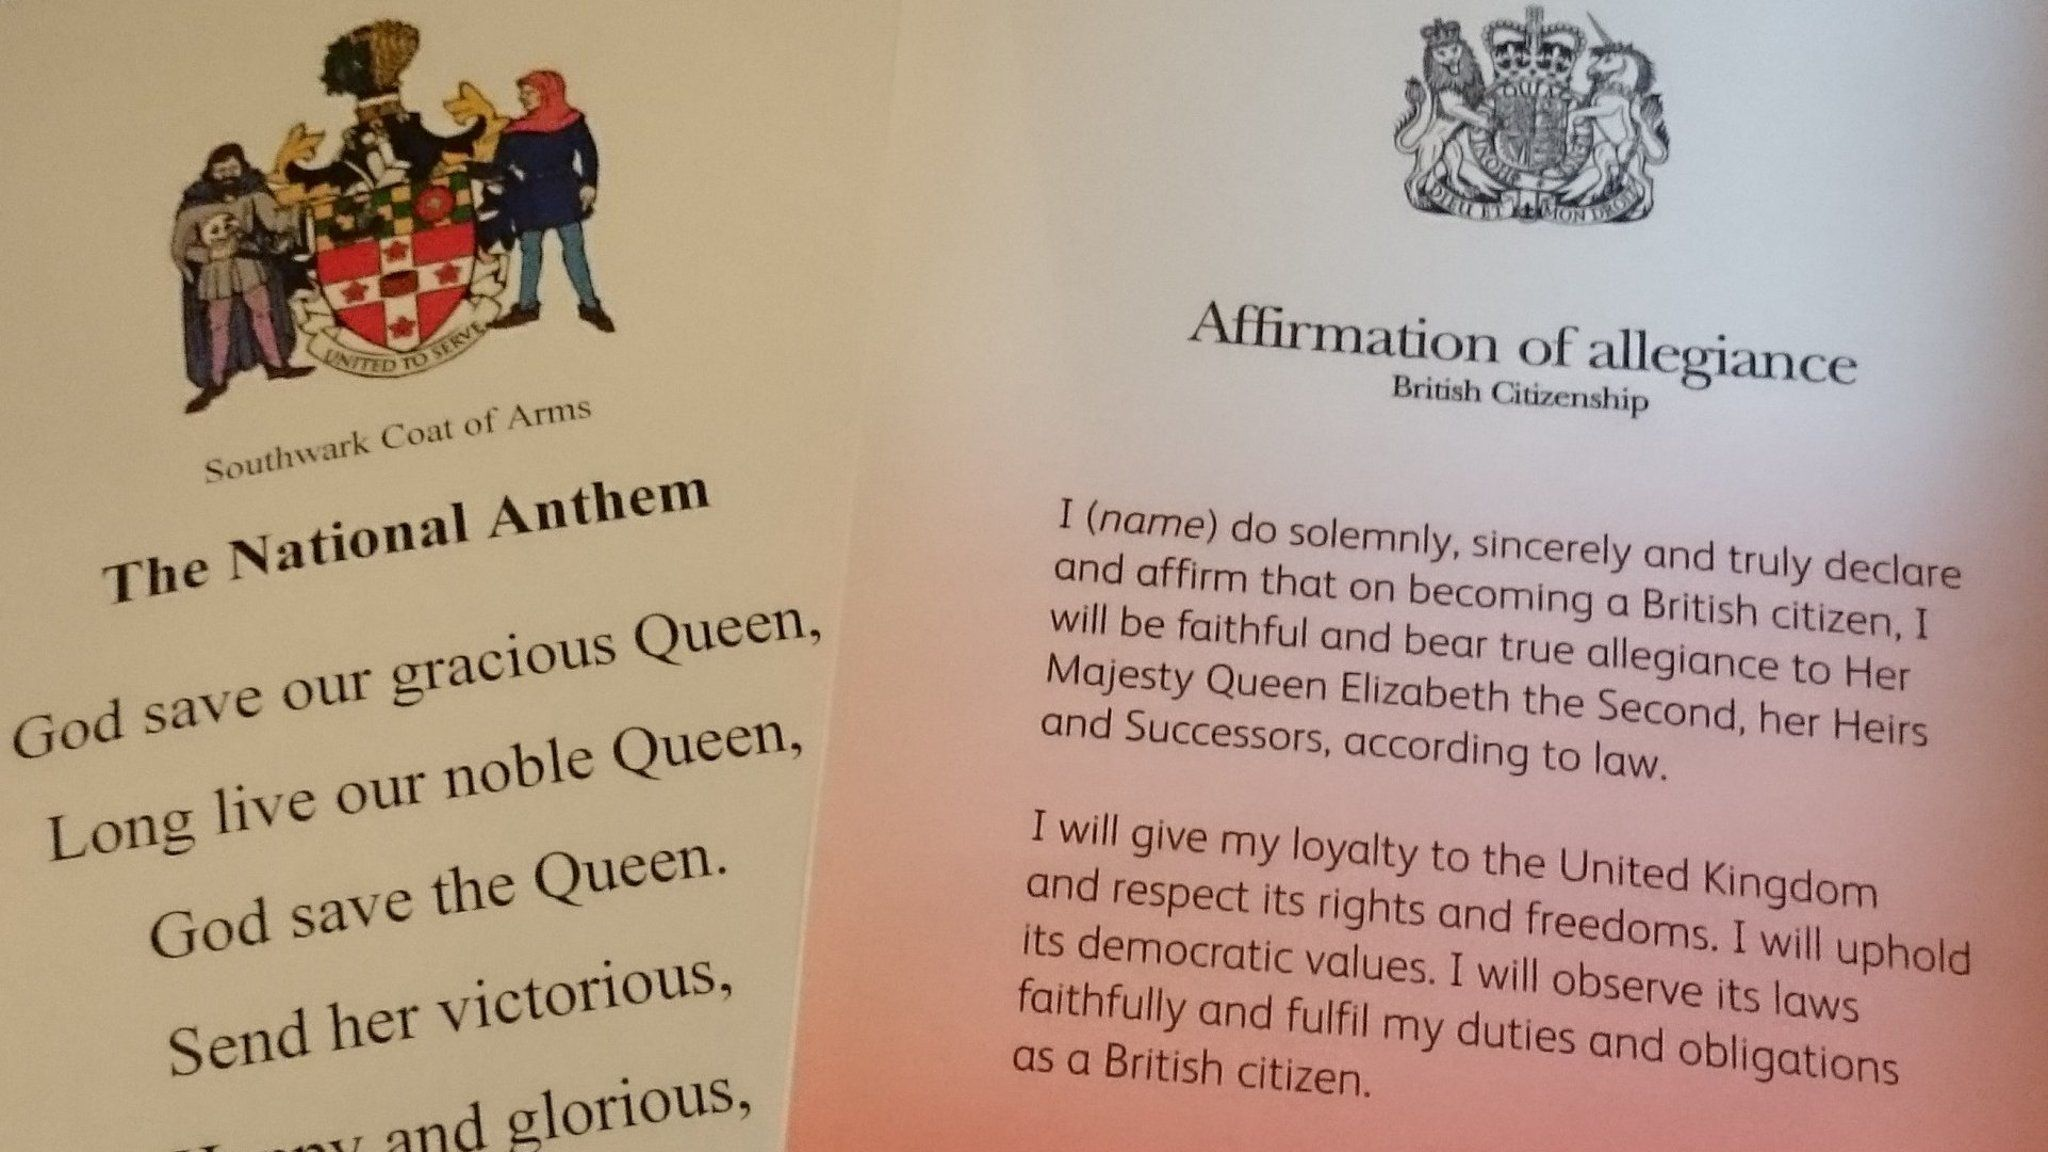 Pin on British citizenship